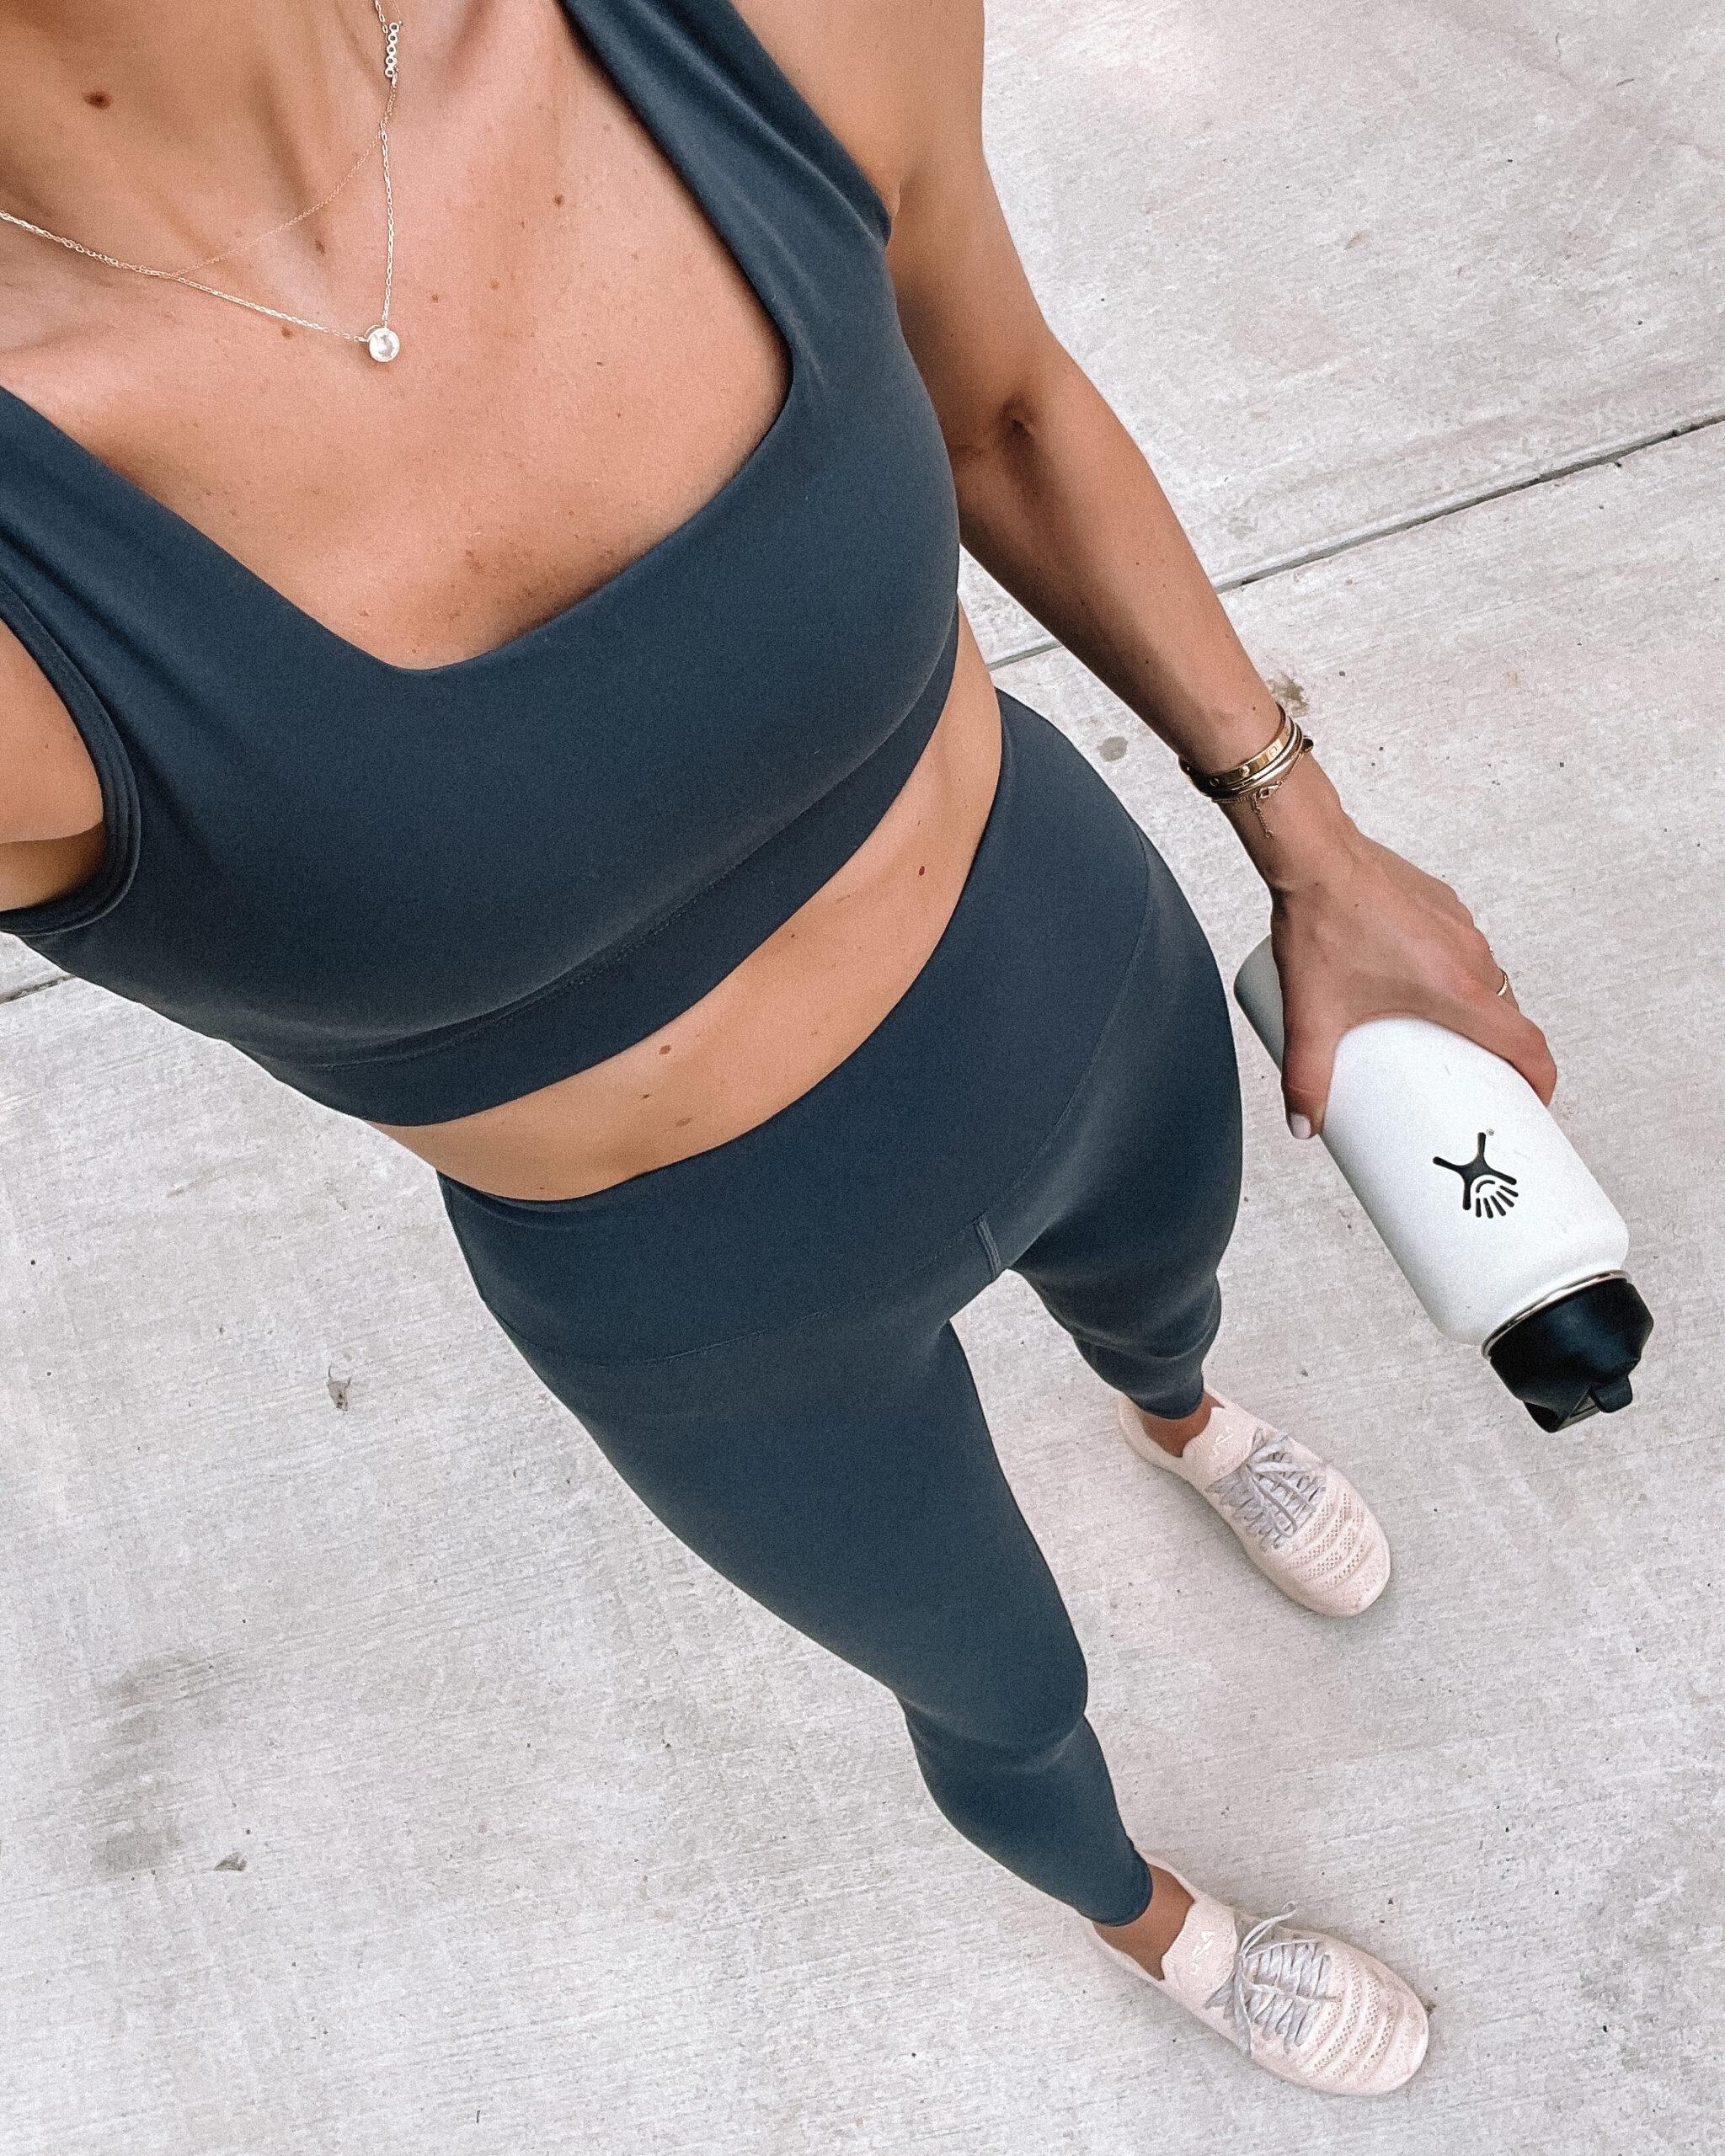 Fashion Jackson Wearing Varley Delta Sports Bra Navy Blue Varley Nita High Waist Legings Navy APL Blush Sneakers White Hydroflask Womens Workout Outfit